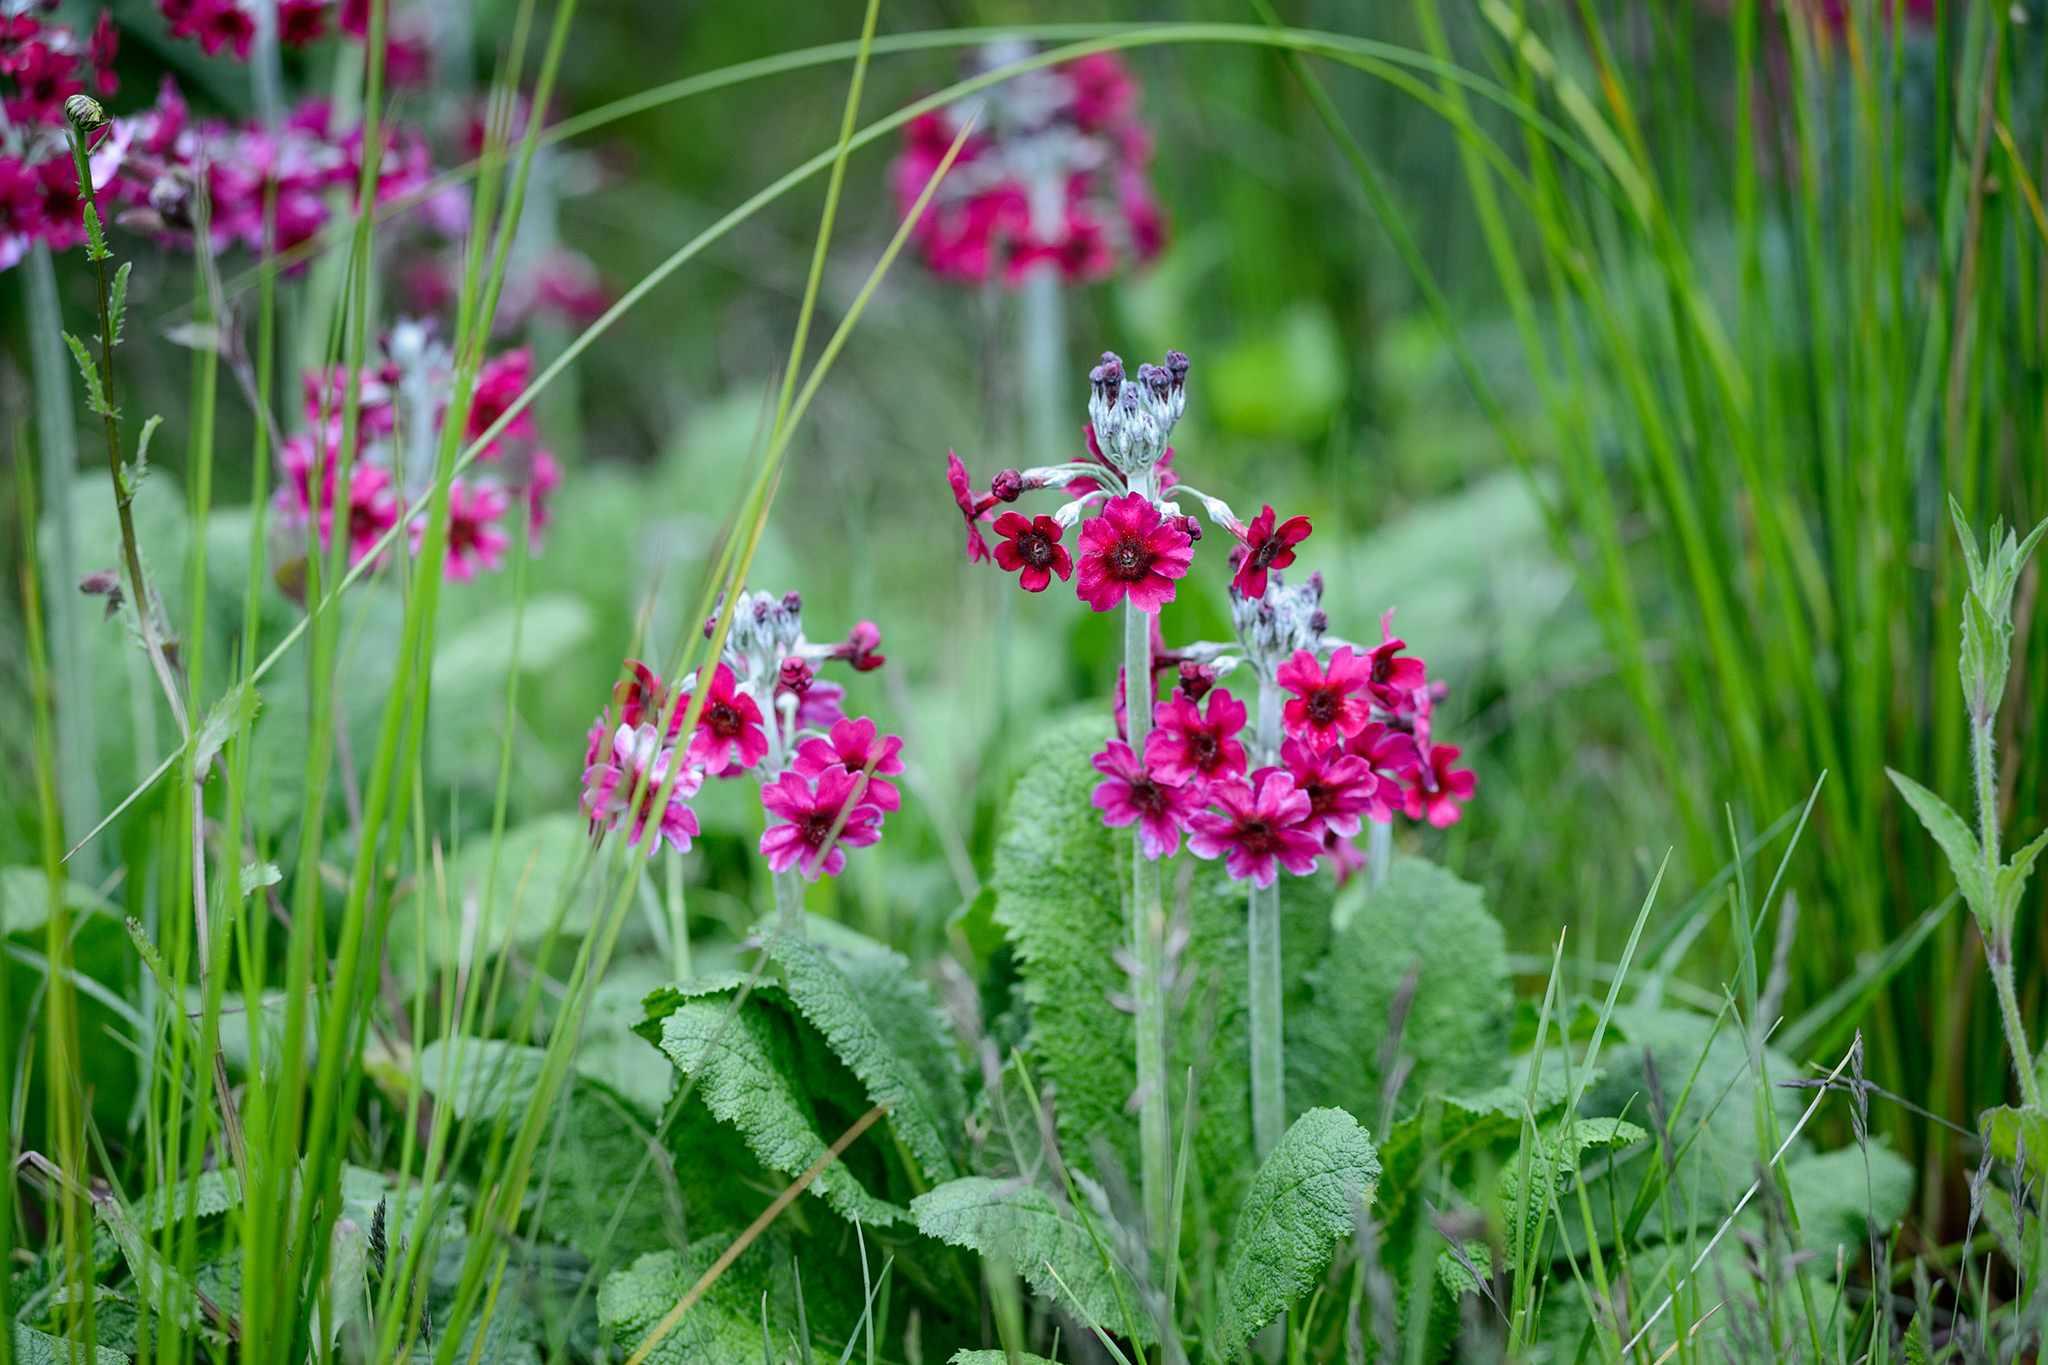 Pink candelabra primula flowers